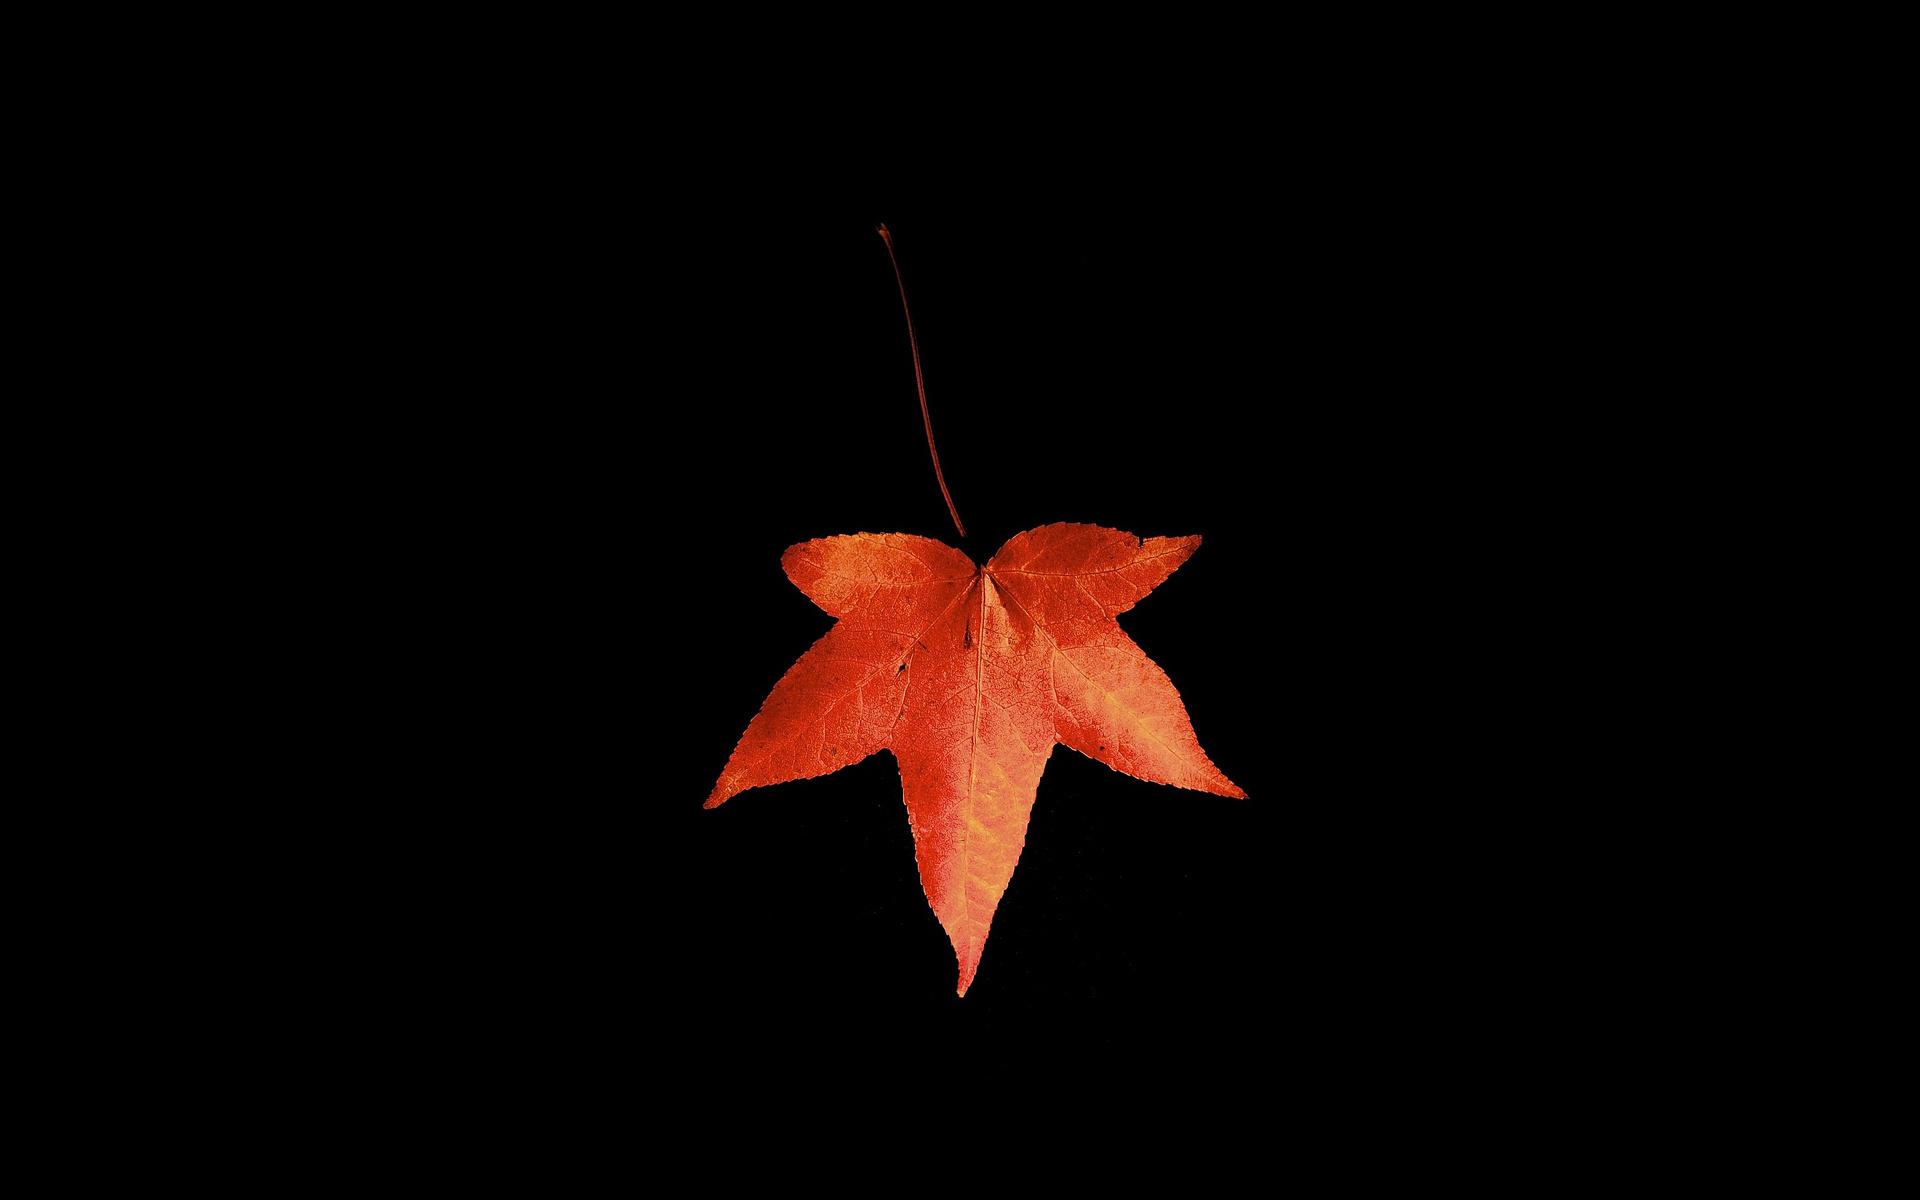 autumn-leaf-wide-wallpaper-582271